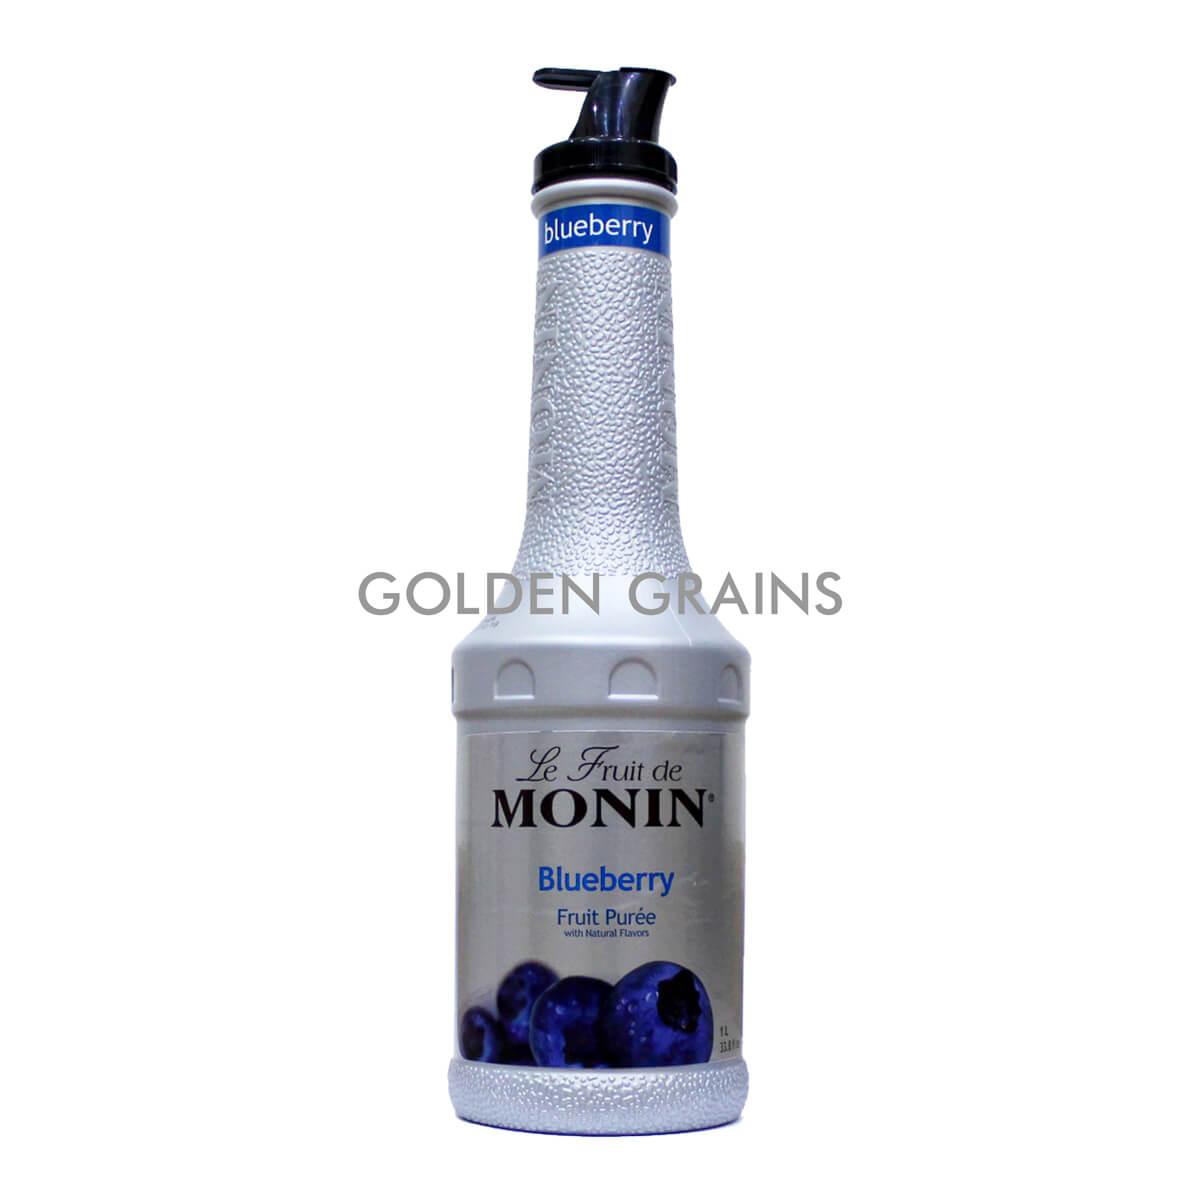 Golden Grains Monin - Blueberry Puree - Front.jpg